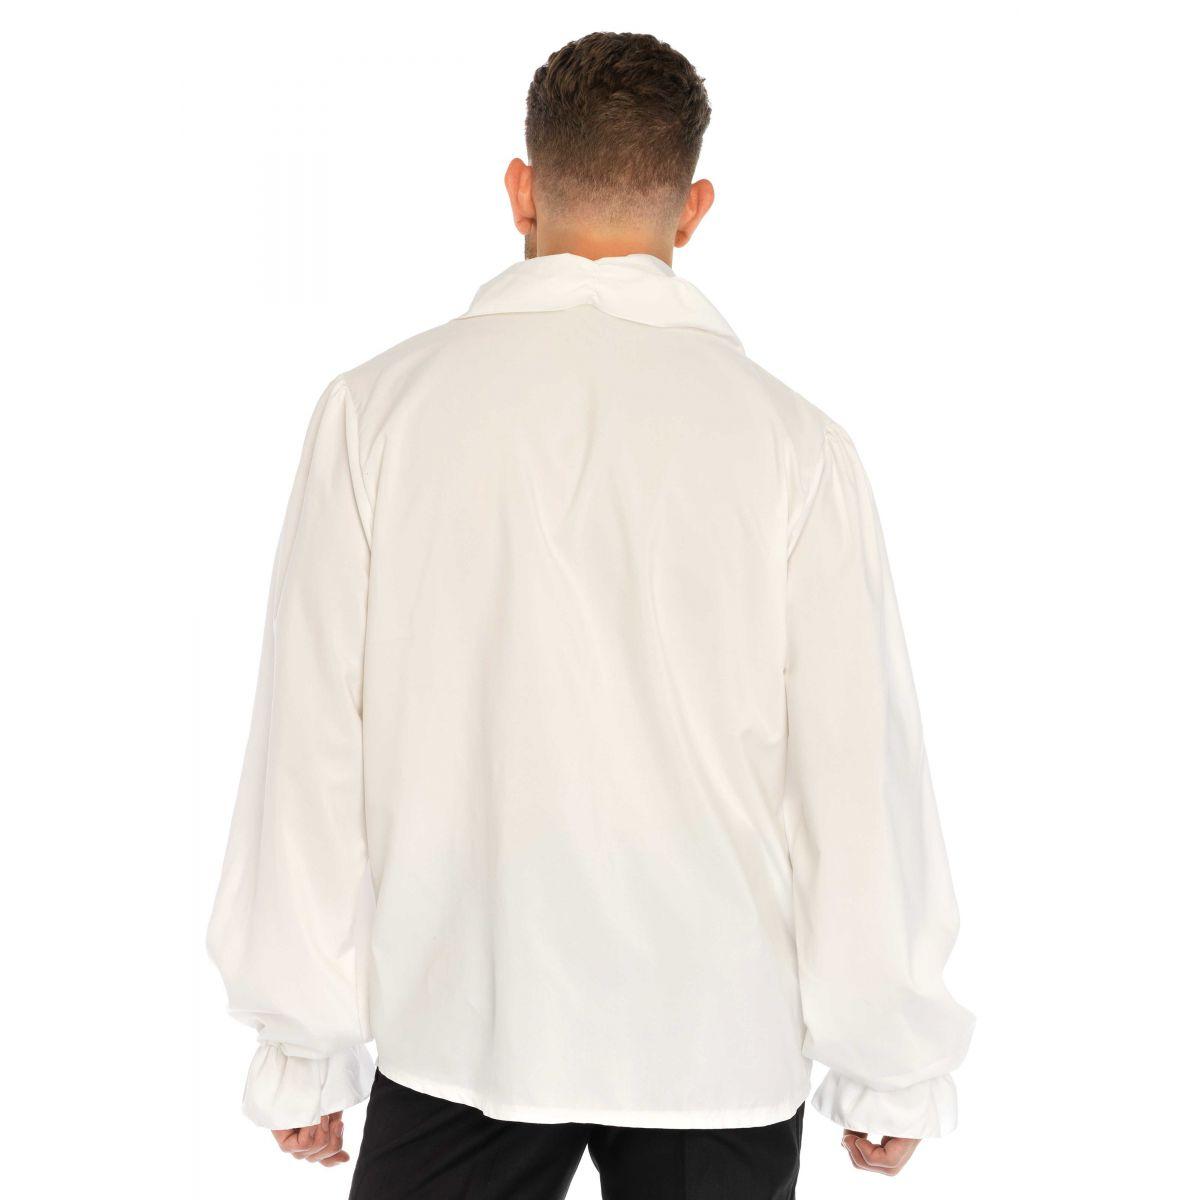 Leg Avenue Disfraz masculino camisa de época con volantes al frente